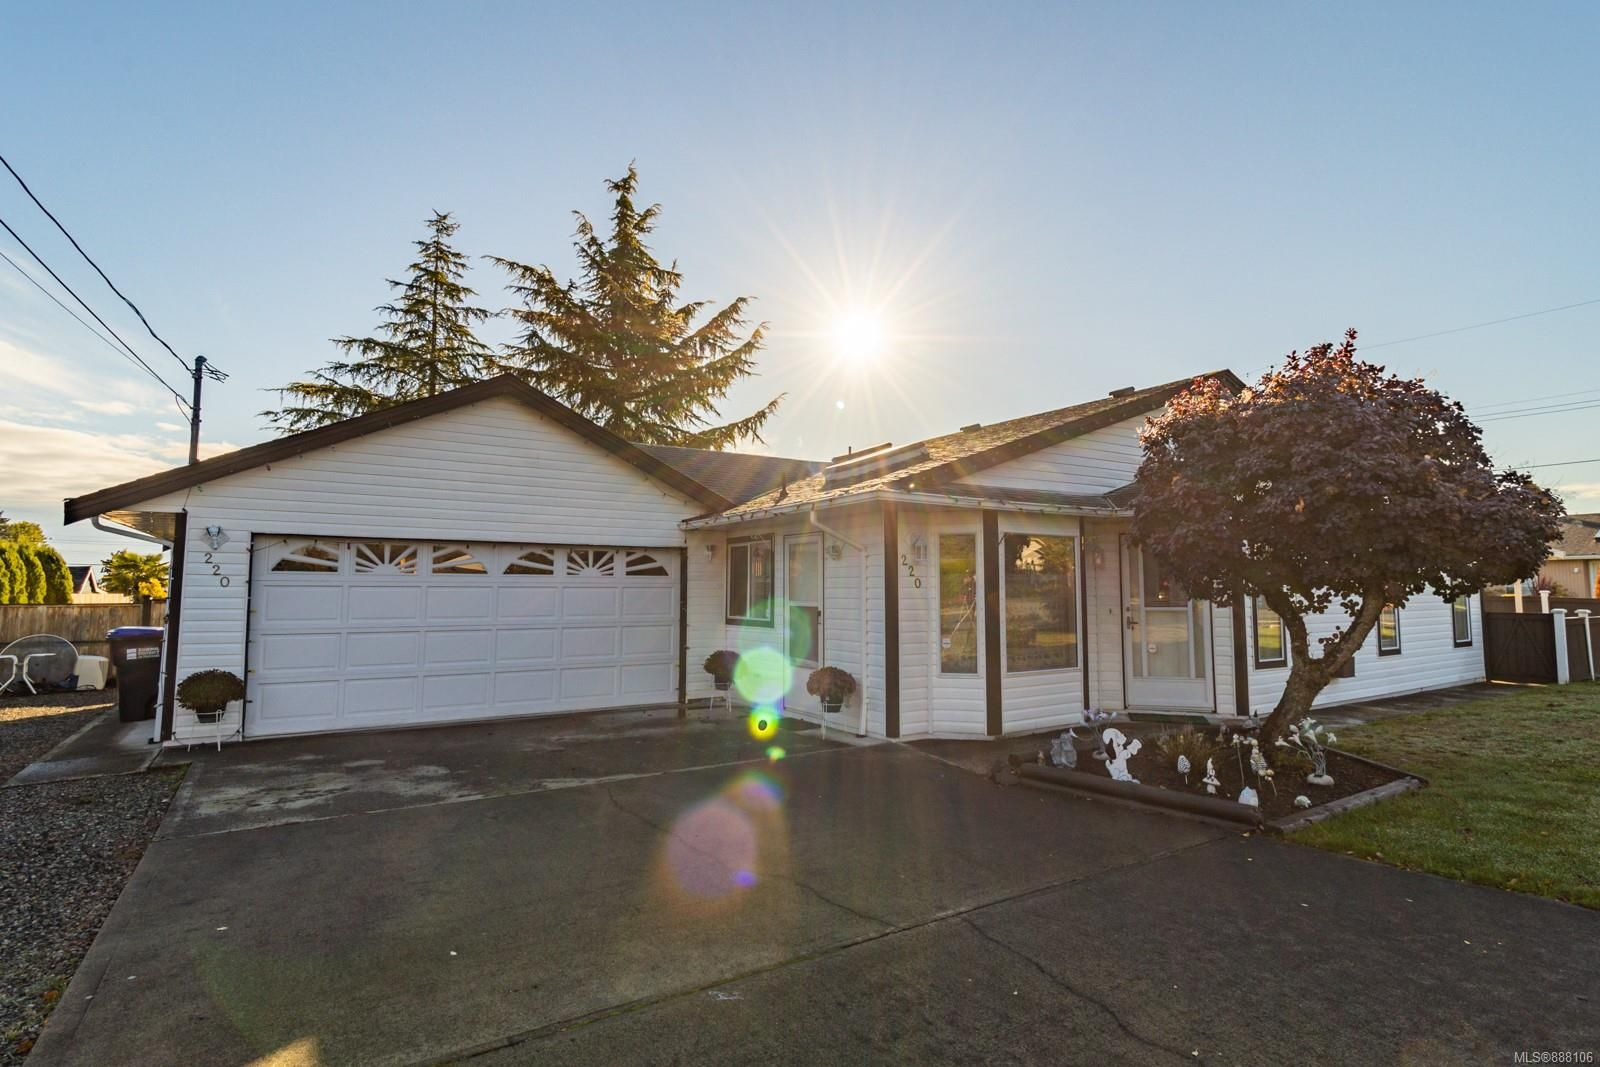 Main Photo: 220 Violet Pl in Parksville: PQ Parksville House for sale (Parksville/Qualicum)  : MLS®# 888106